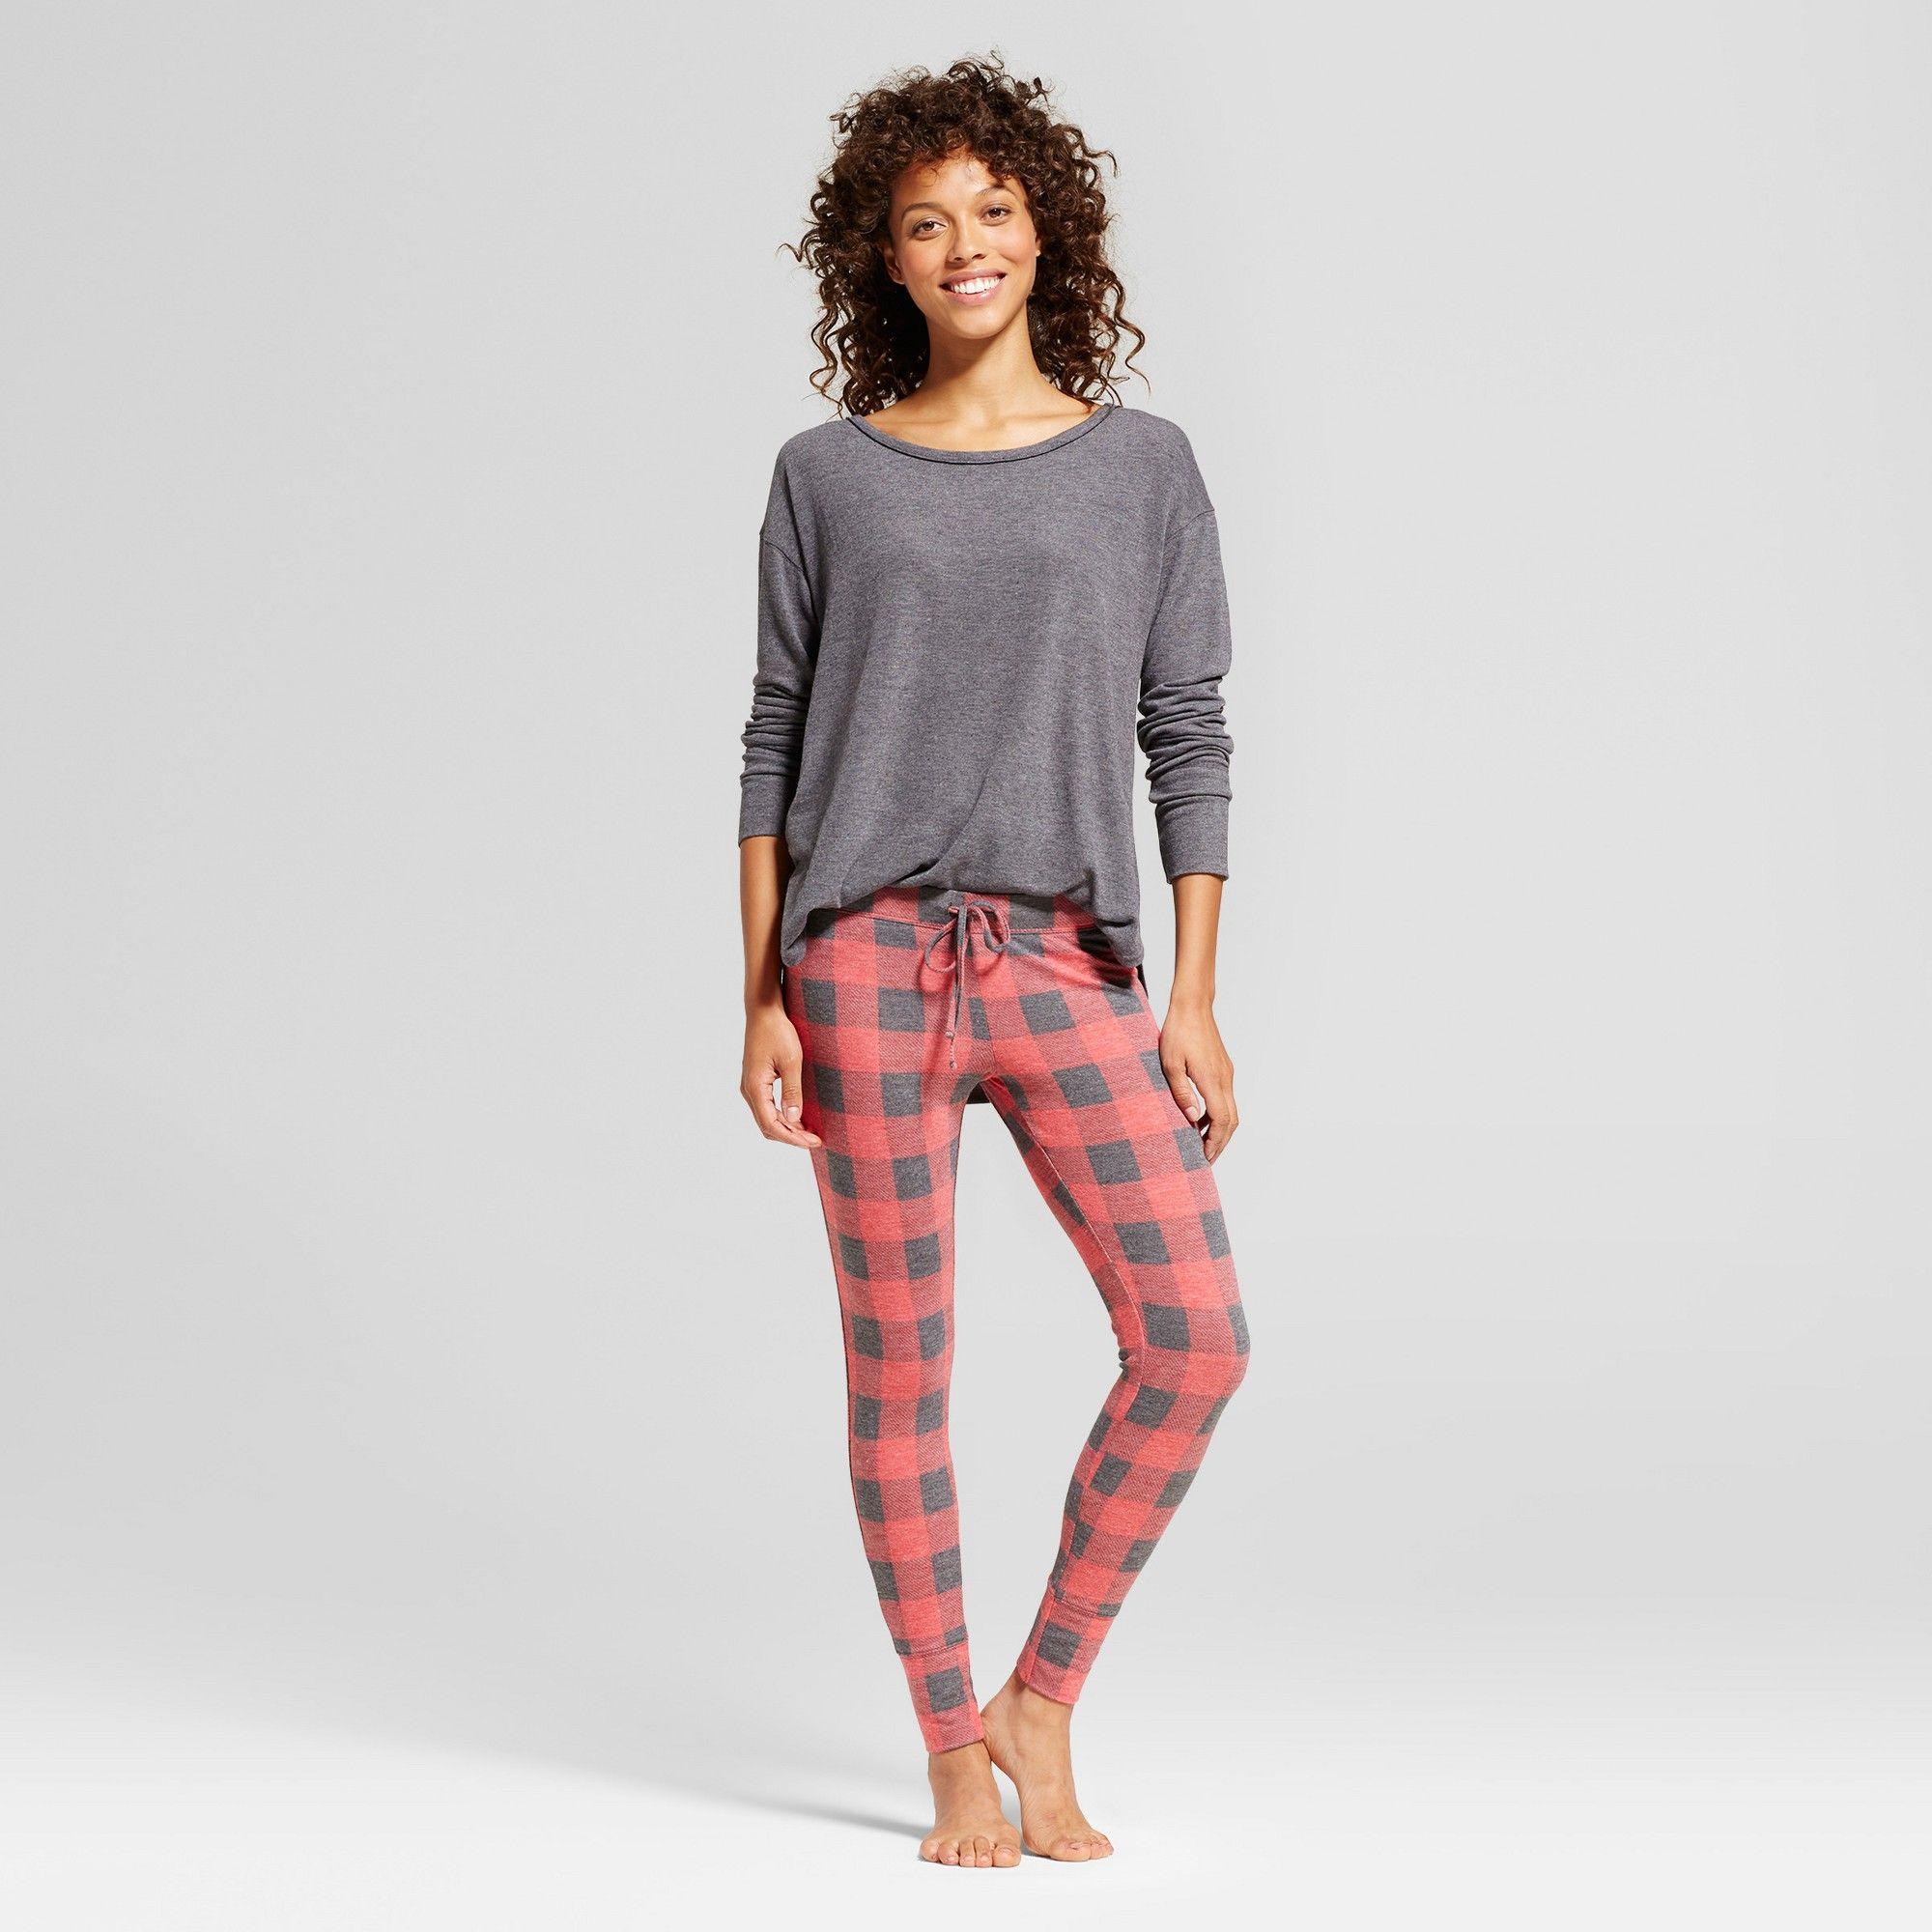 41aad109be Women s Pajama Set - Xhilaration Cupid Red XS